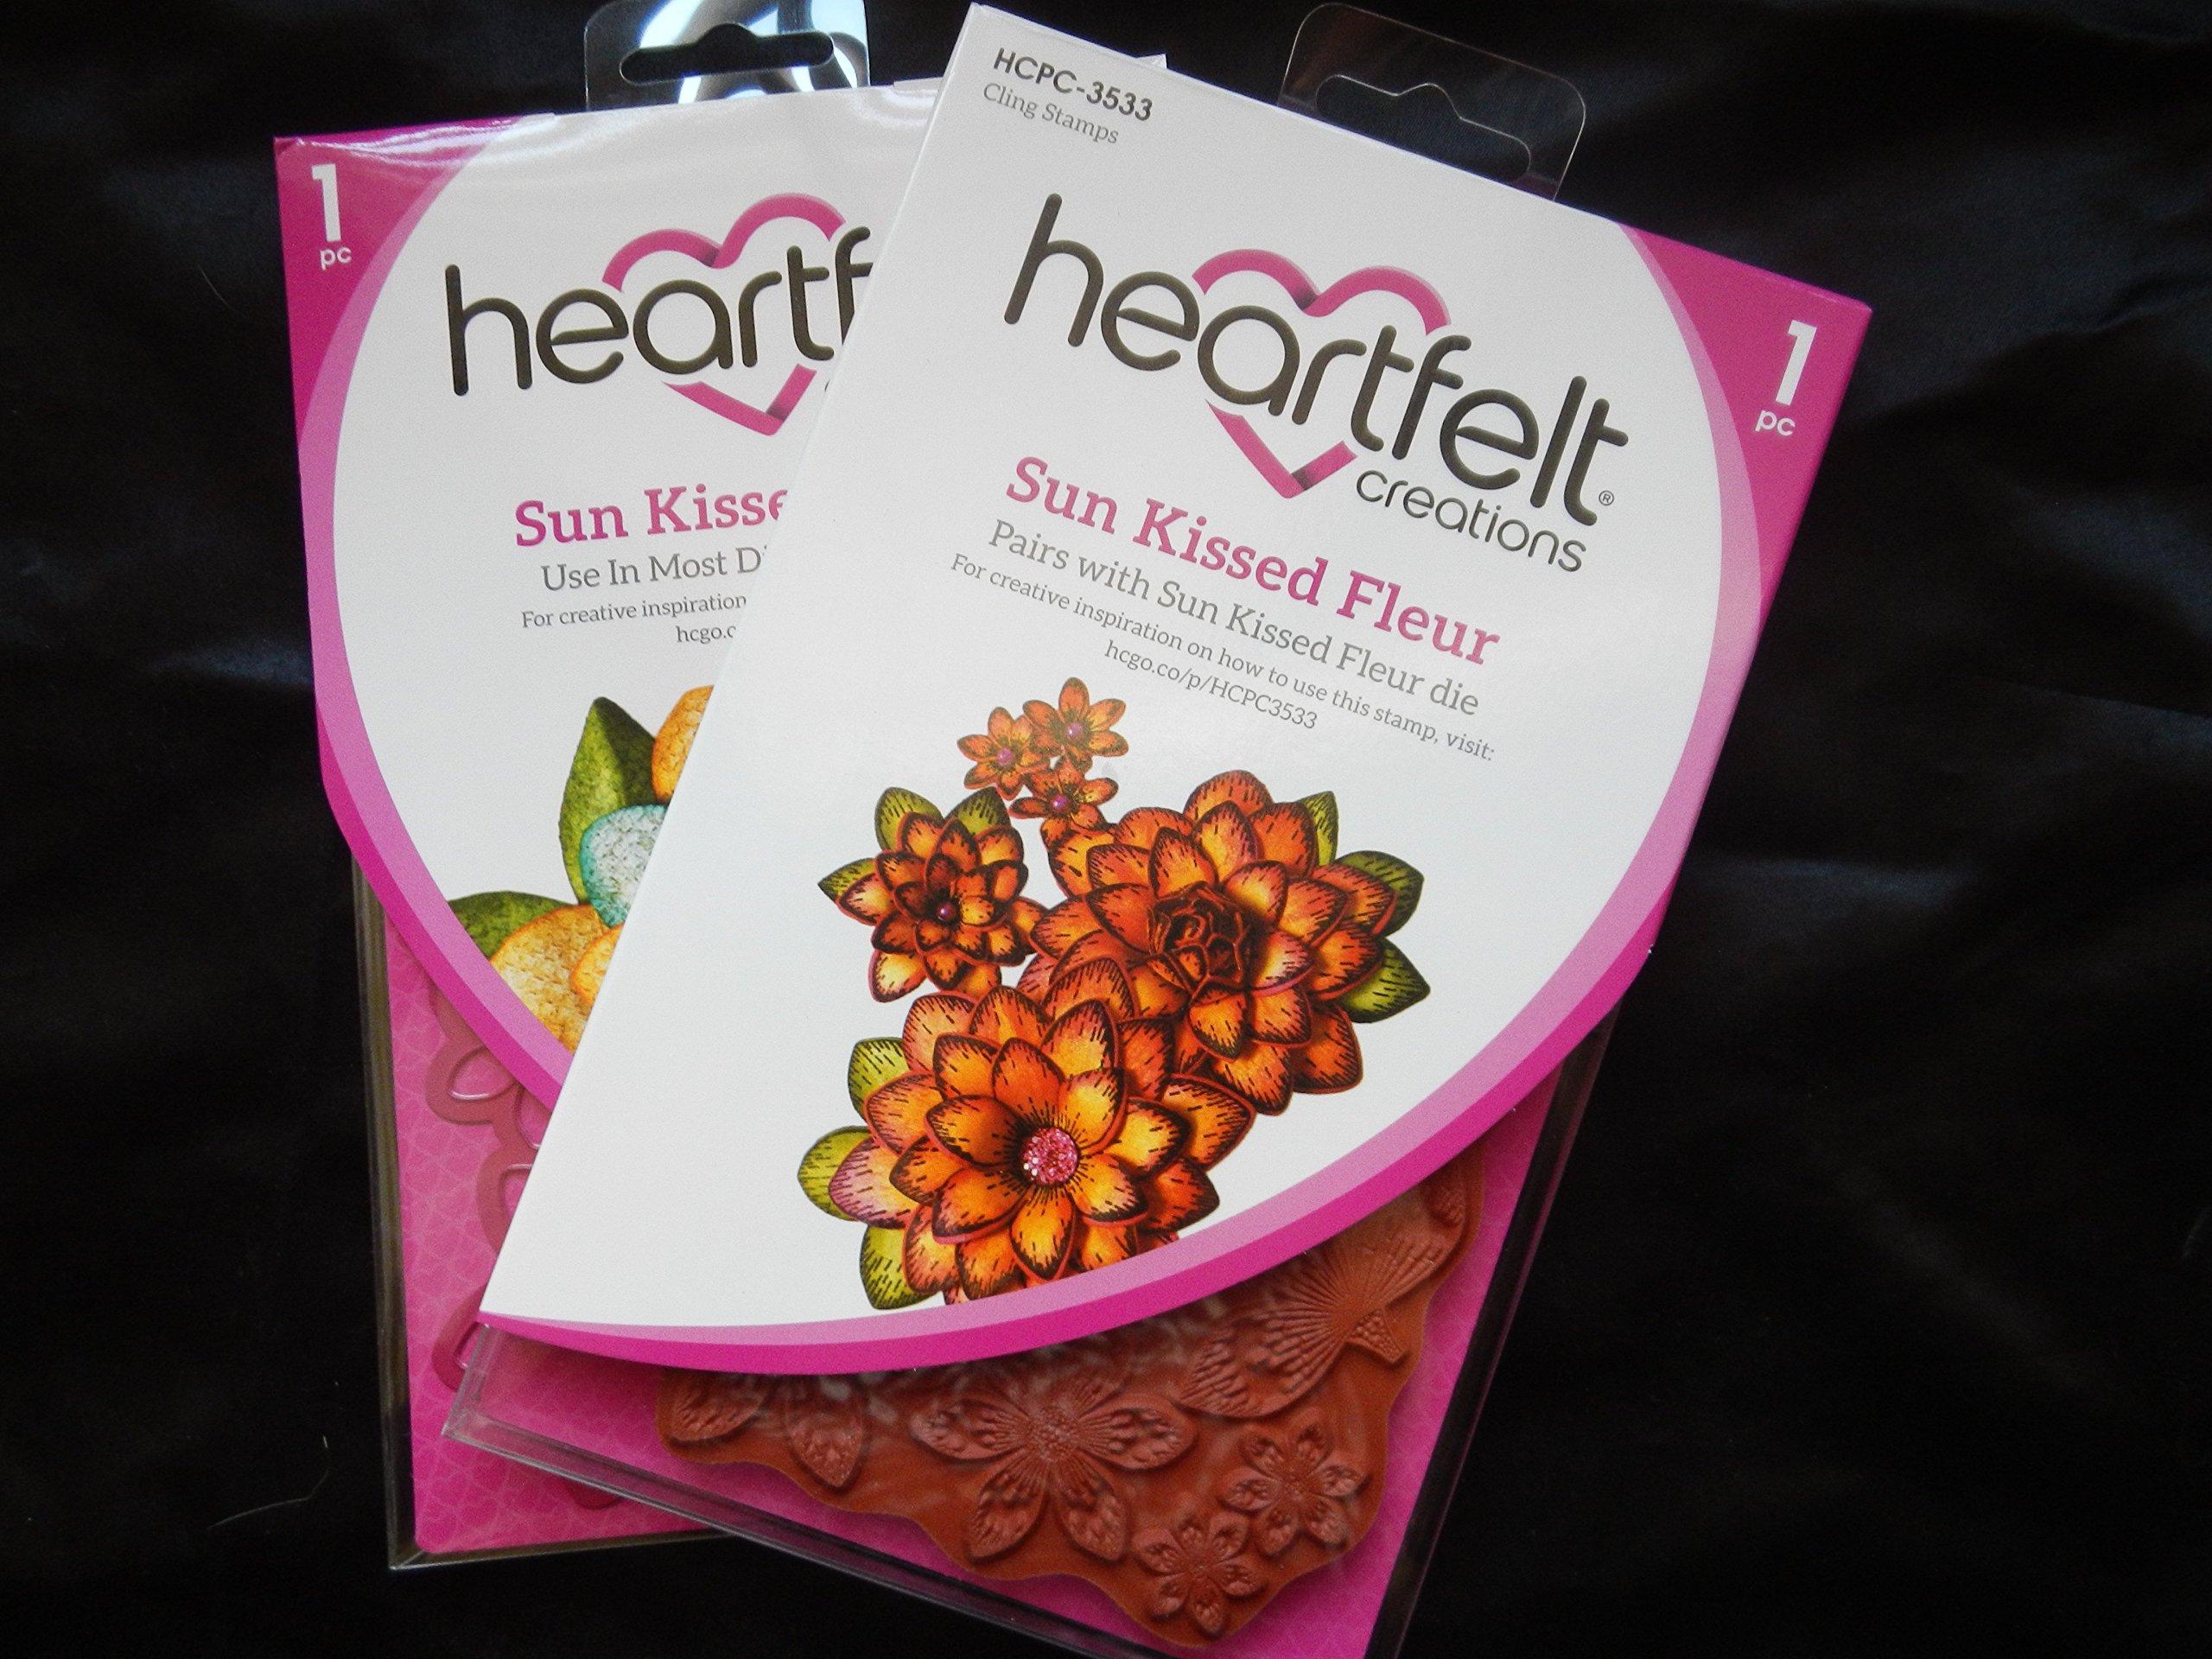 Heartfelt Creations Sun Kissed Fleur Die and Cling Rubber Stamp Set Bundle 2 Pieces